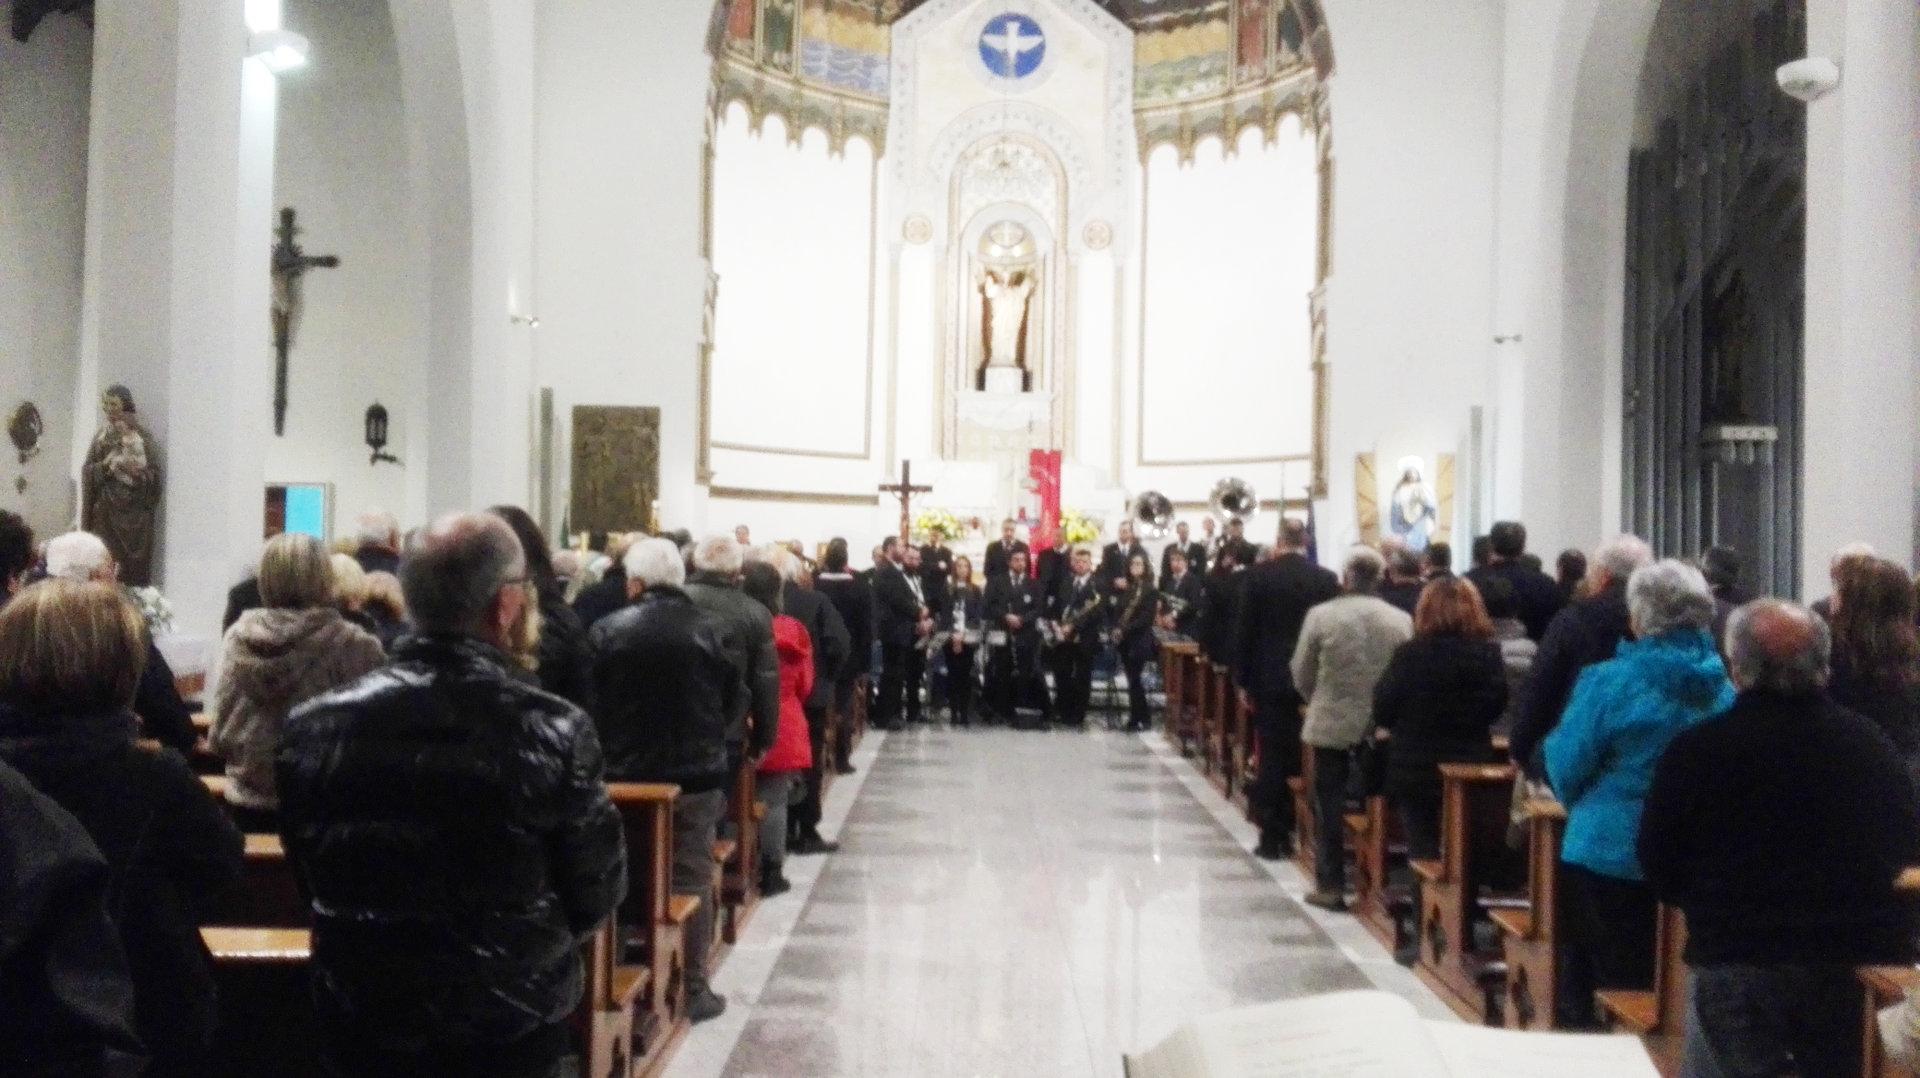 Concerto in onore della Virgo Fidelis protettrice dell'Arma dei Carabinieri